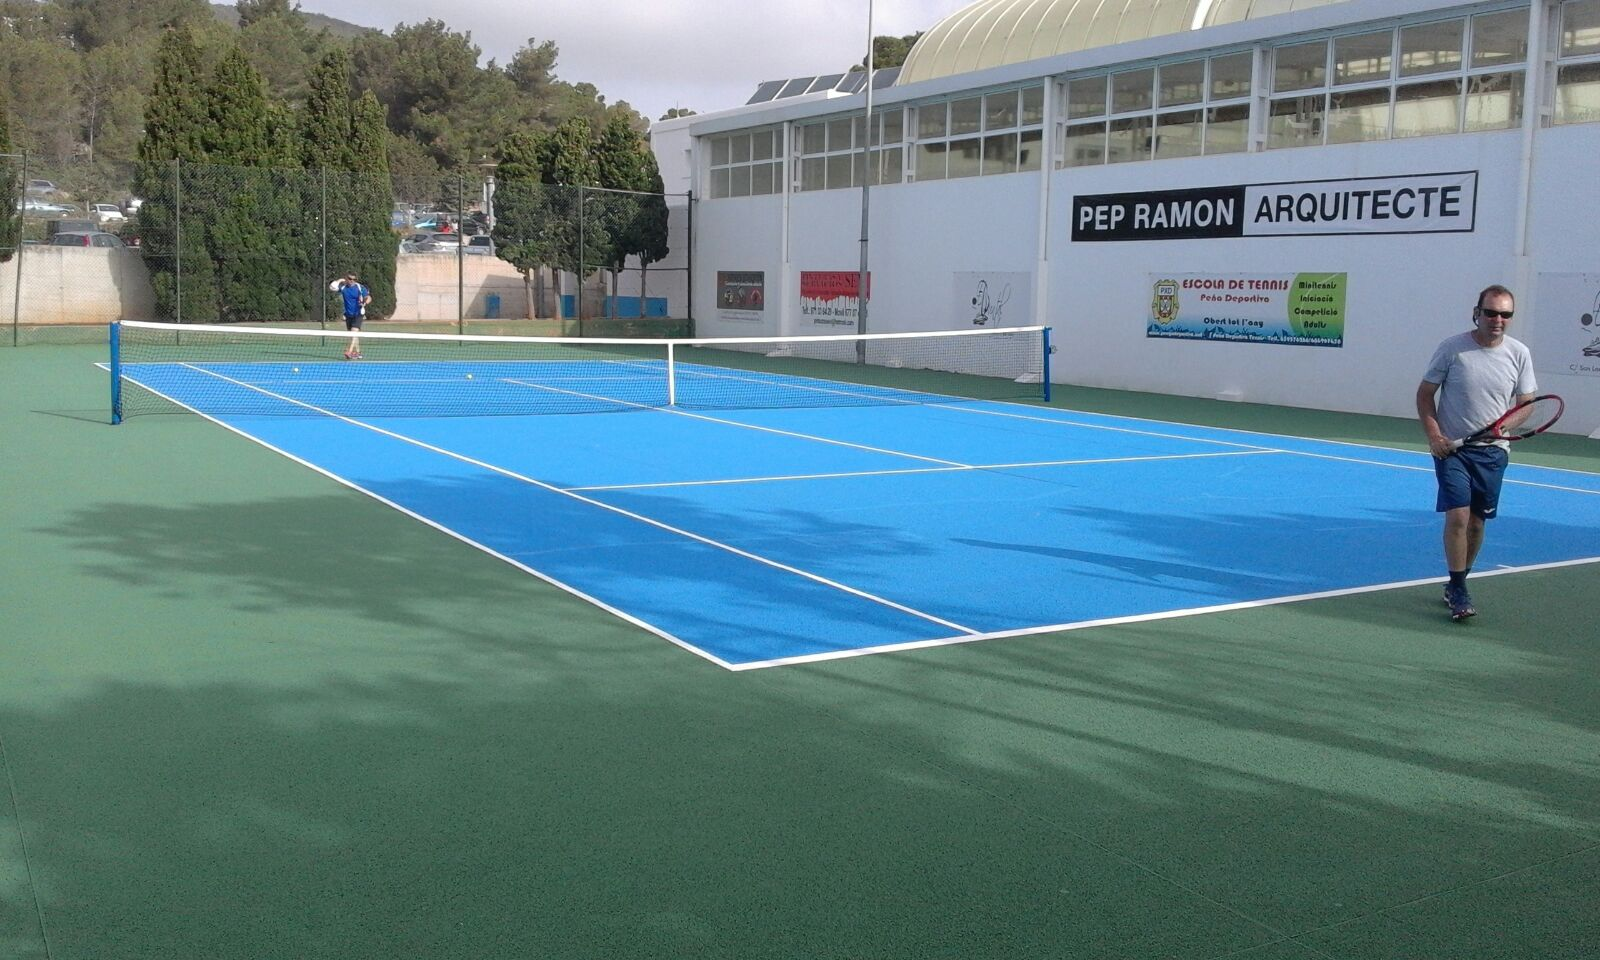 reparacion-pista-tenis-hormigon-tennisquick